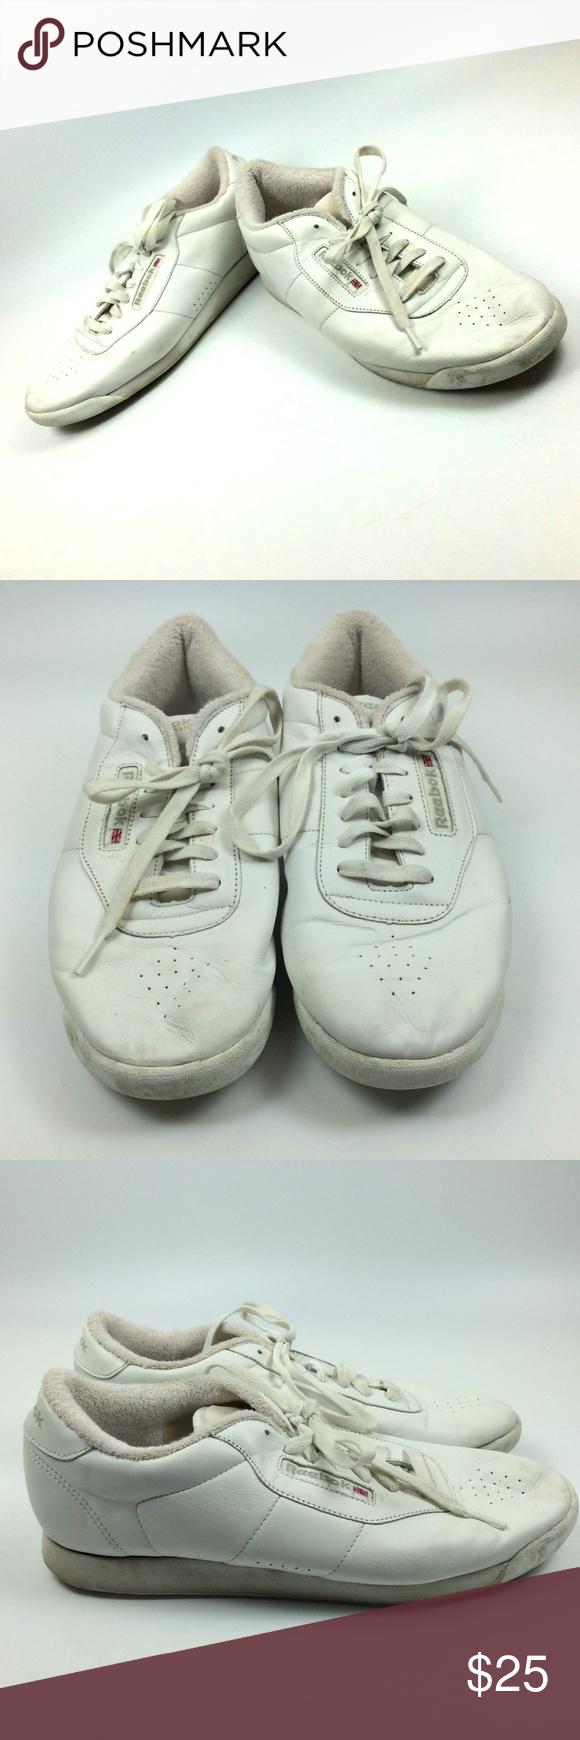 f88c0eb404c Reekbok Classics White Princess Leather Retro OG Reekbok Classics Womens  Size 11 White Princess Leather Walking